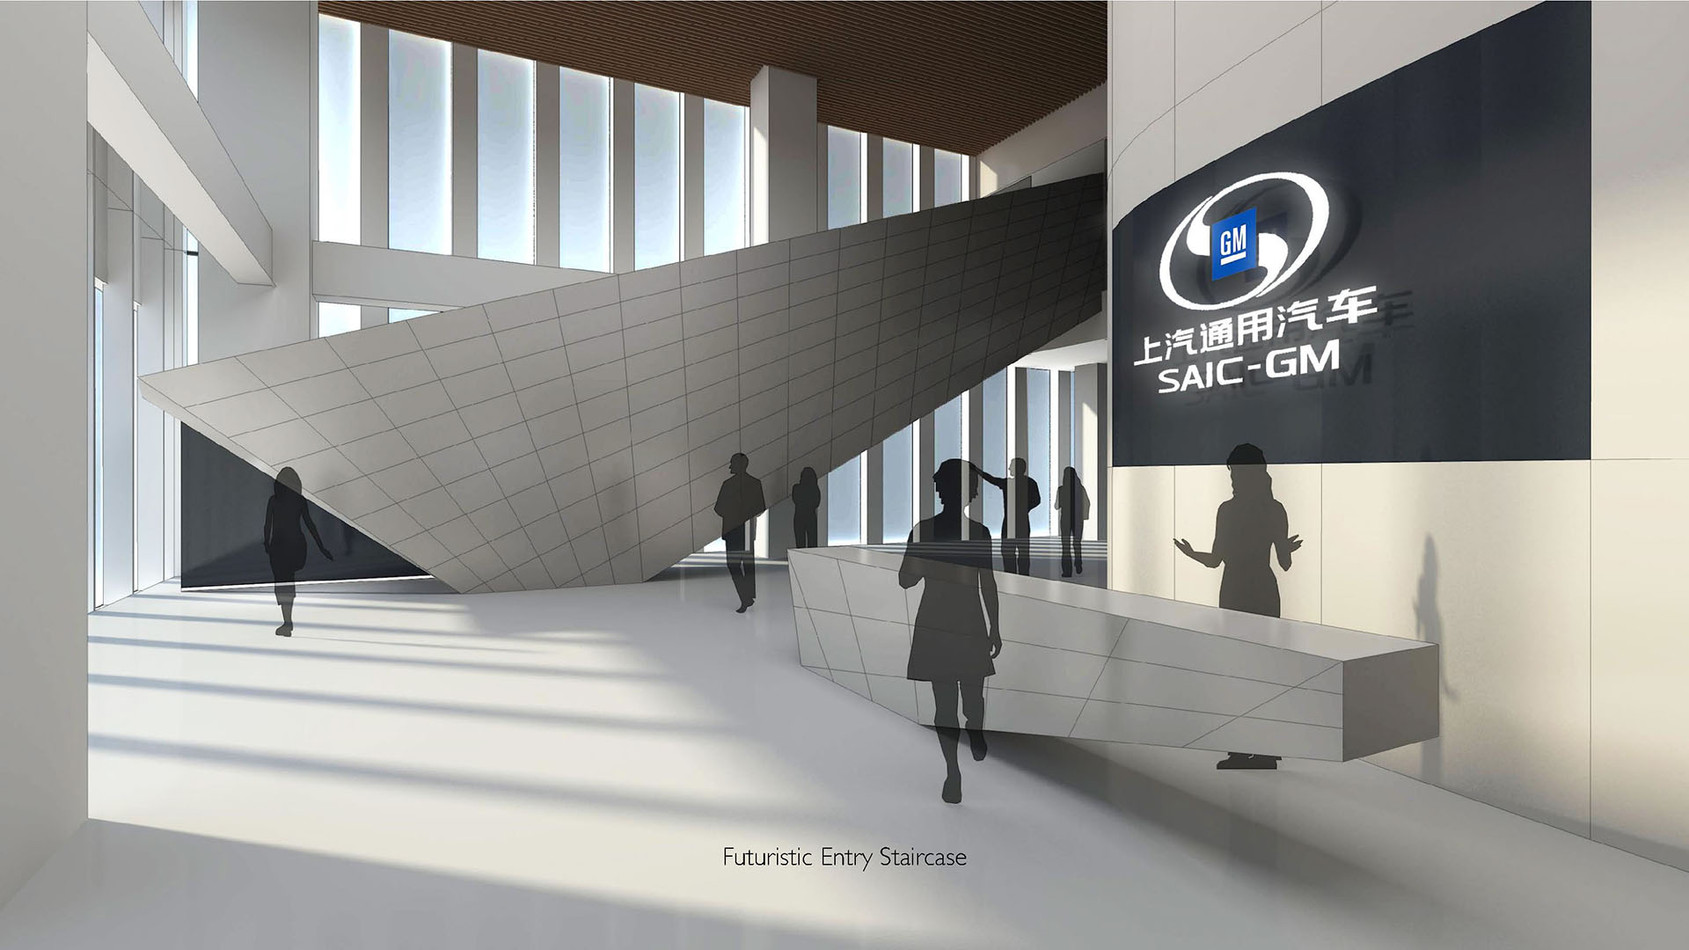 SGM-CORPORATE-MUSEUM-EN 05.jpg